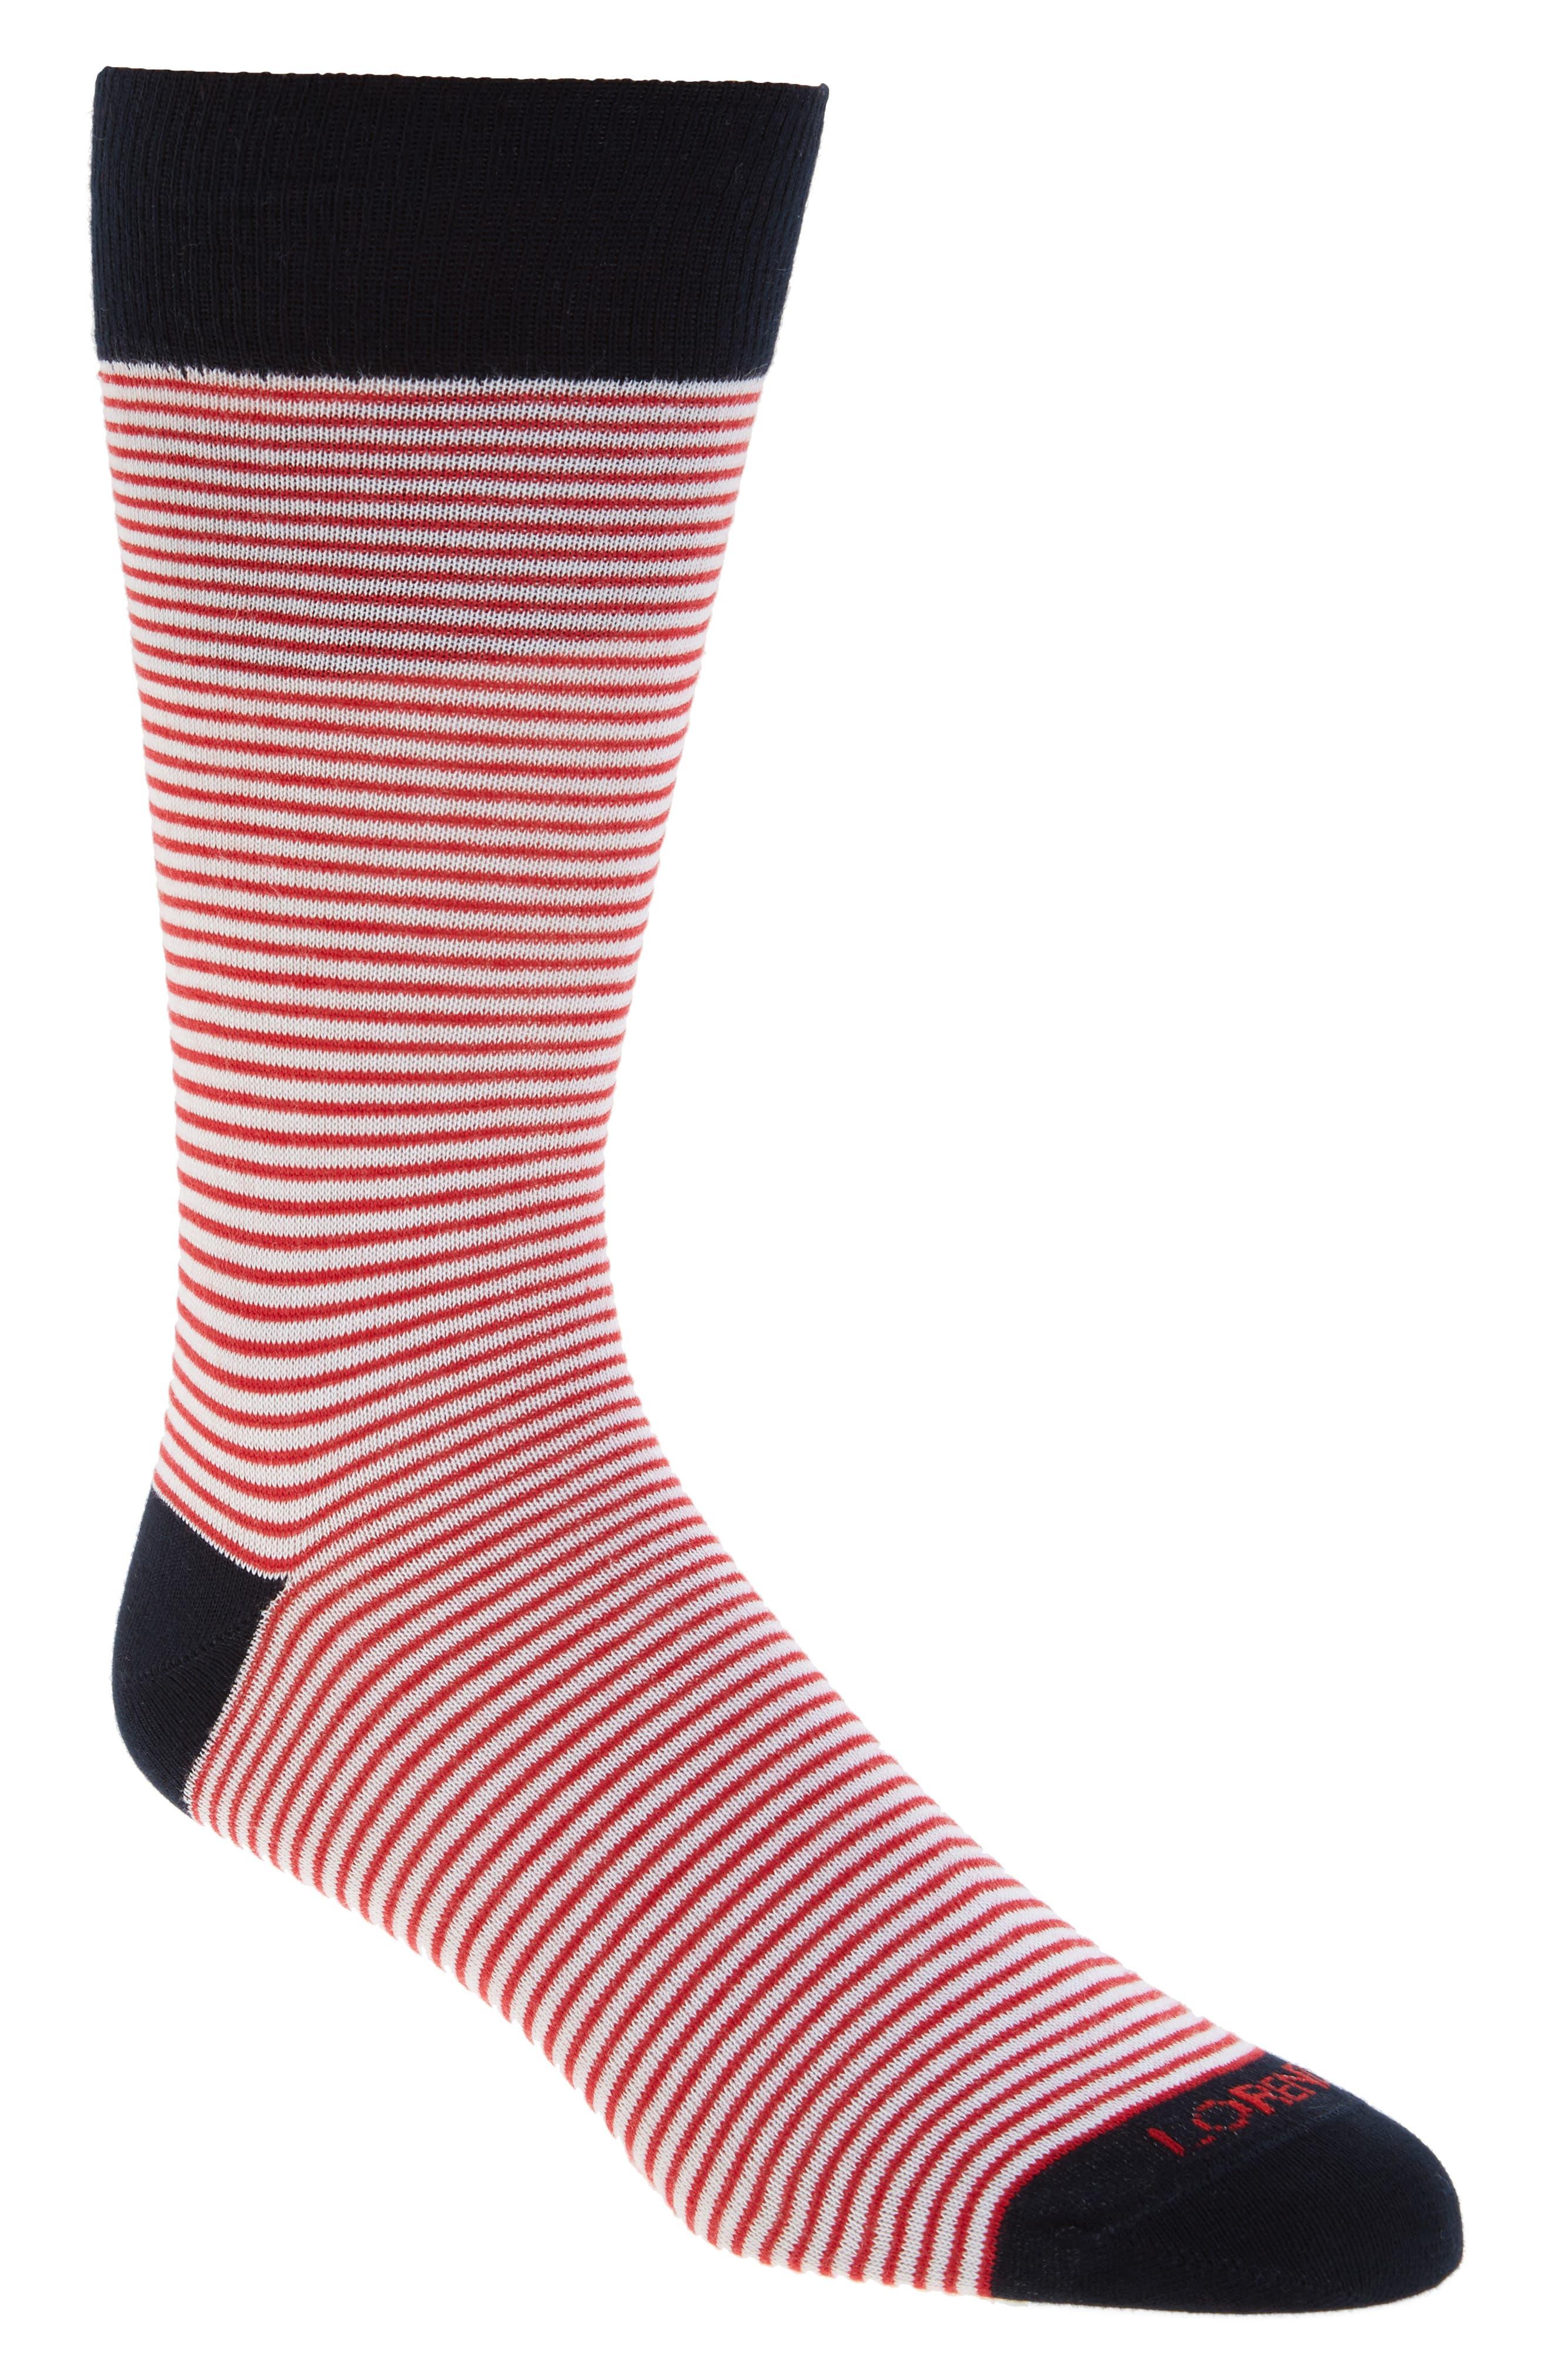 LORENZO UOMO Mini Stripe Crew Socks